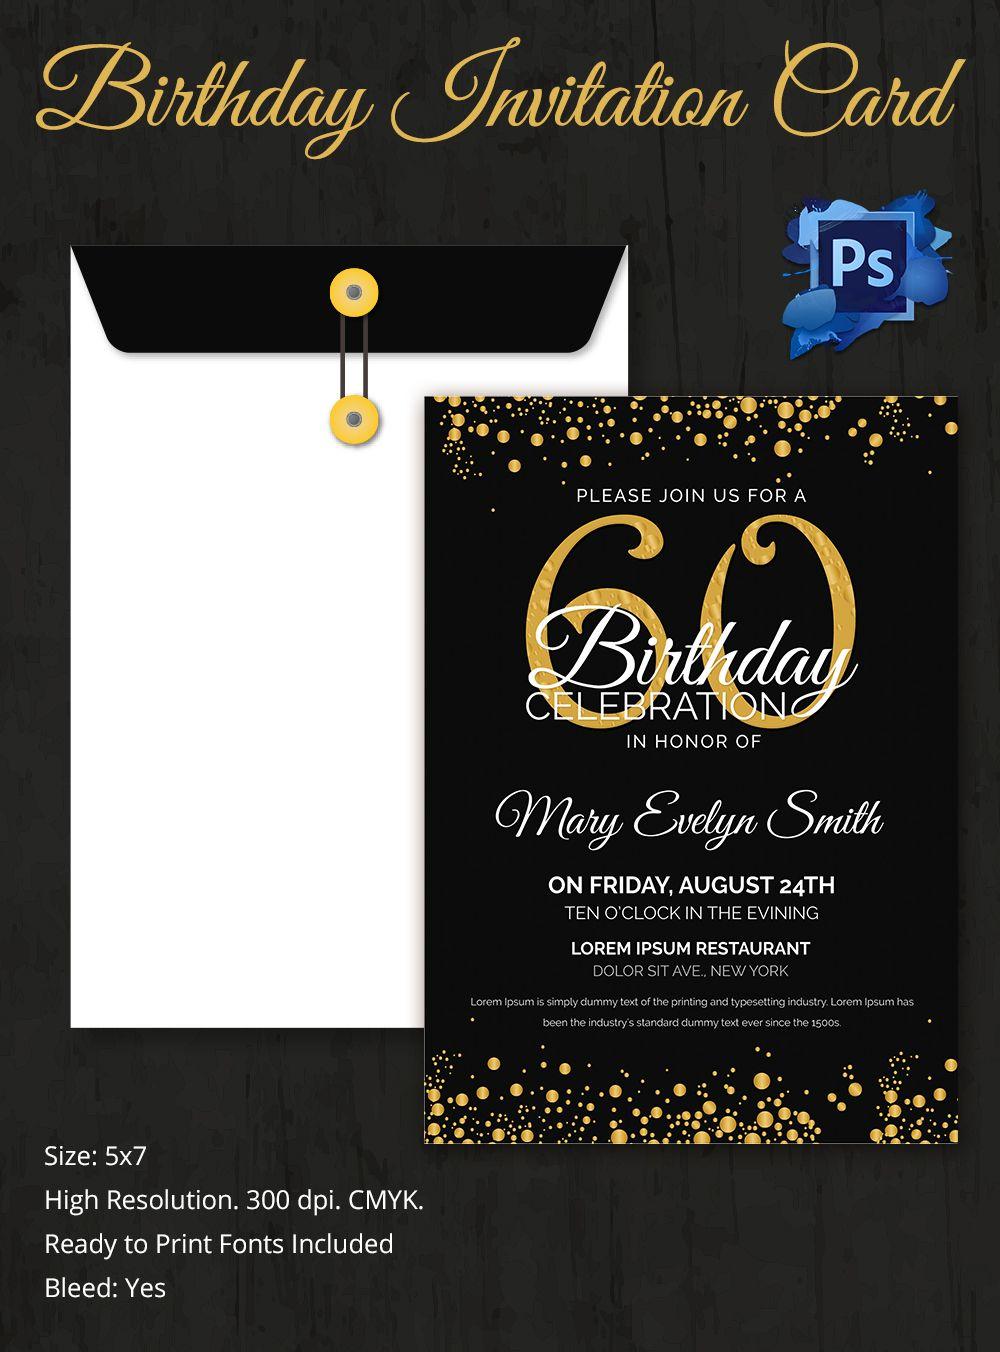 Psd Ai Word Free Premium Templates 60th Birthday Invitations Party Invite Template 40th Birthday Invitations